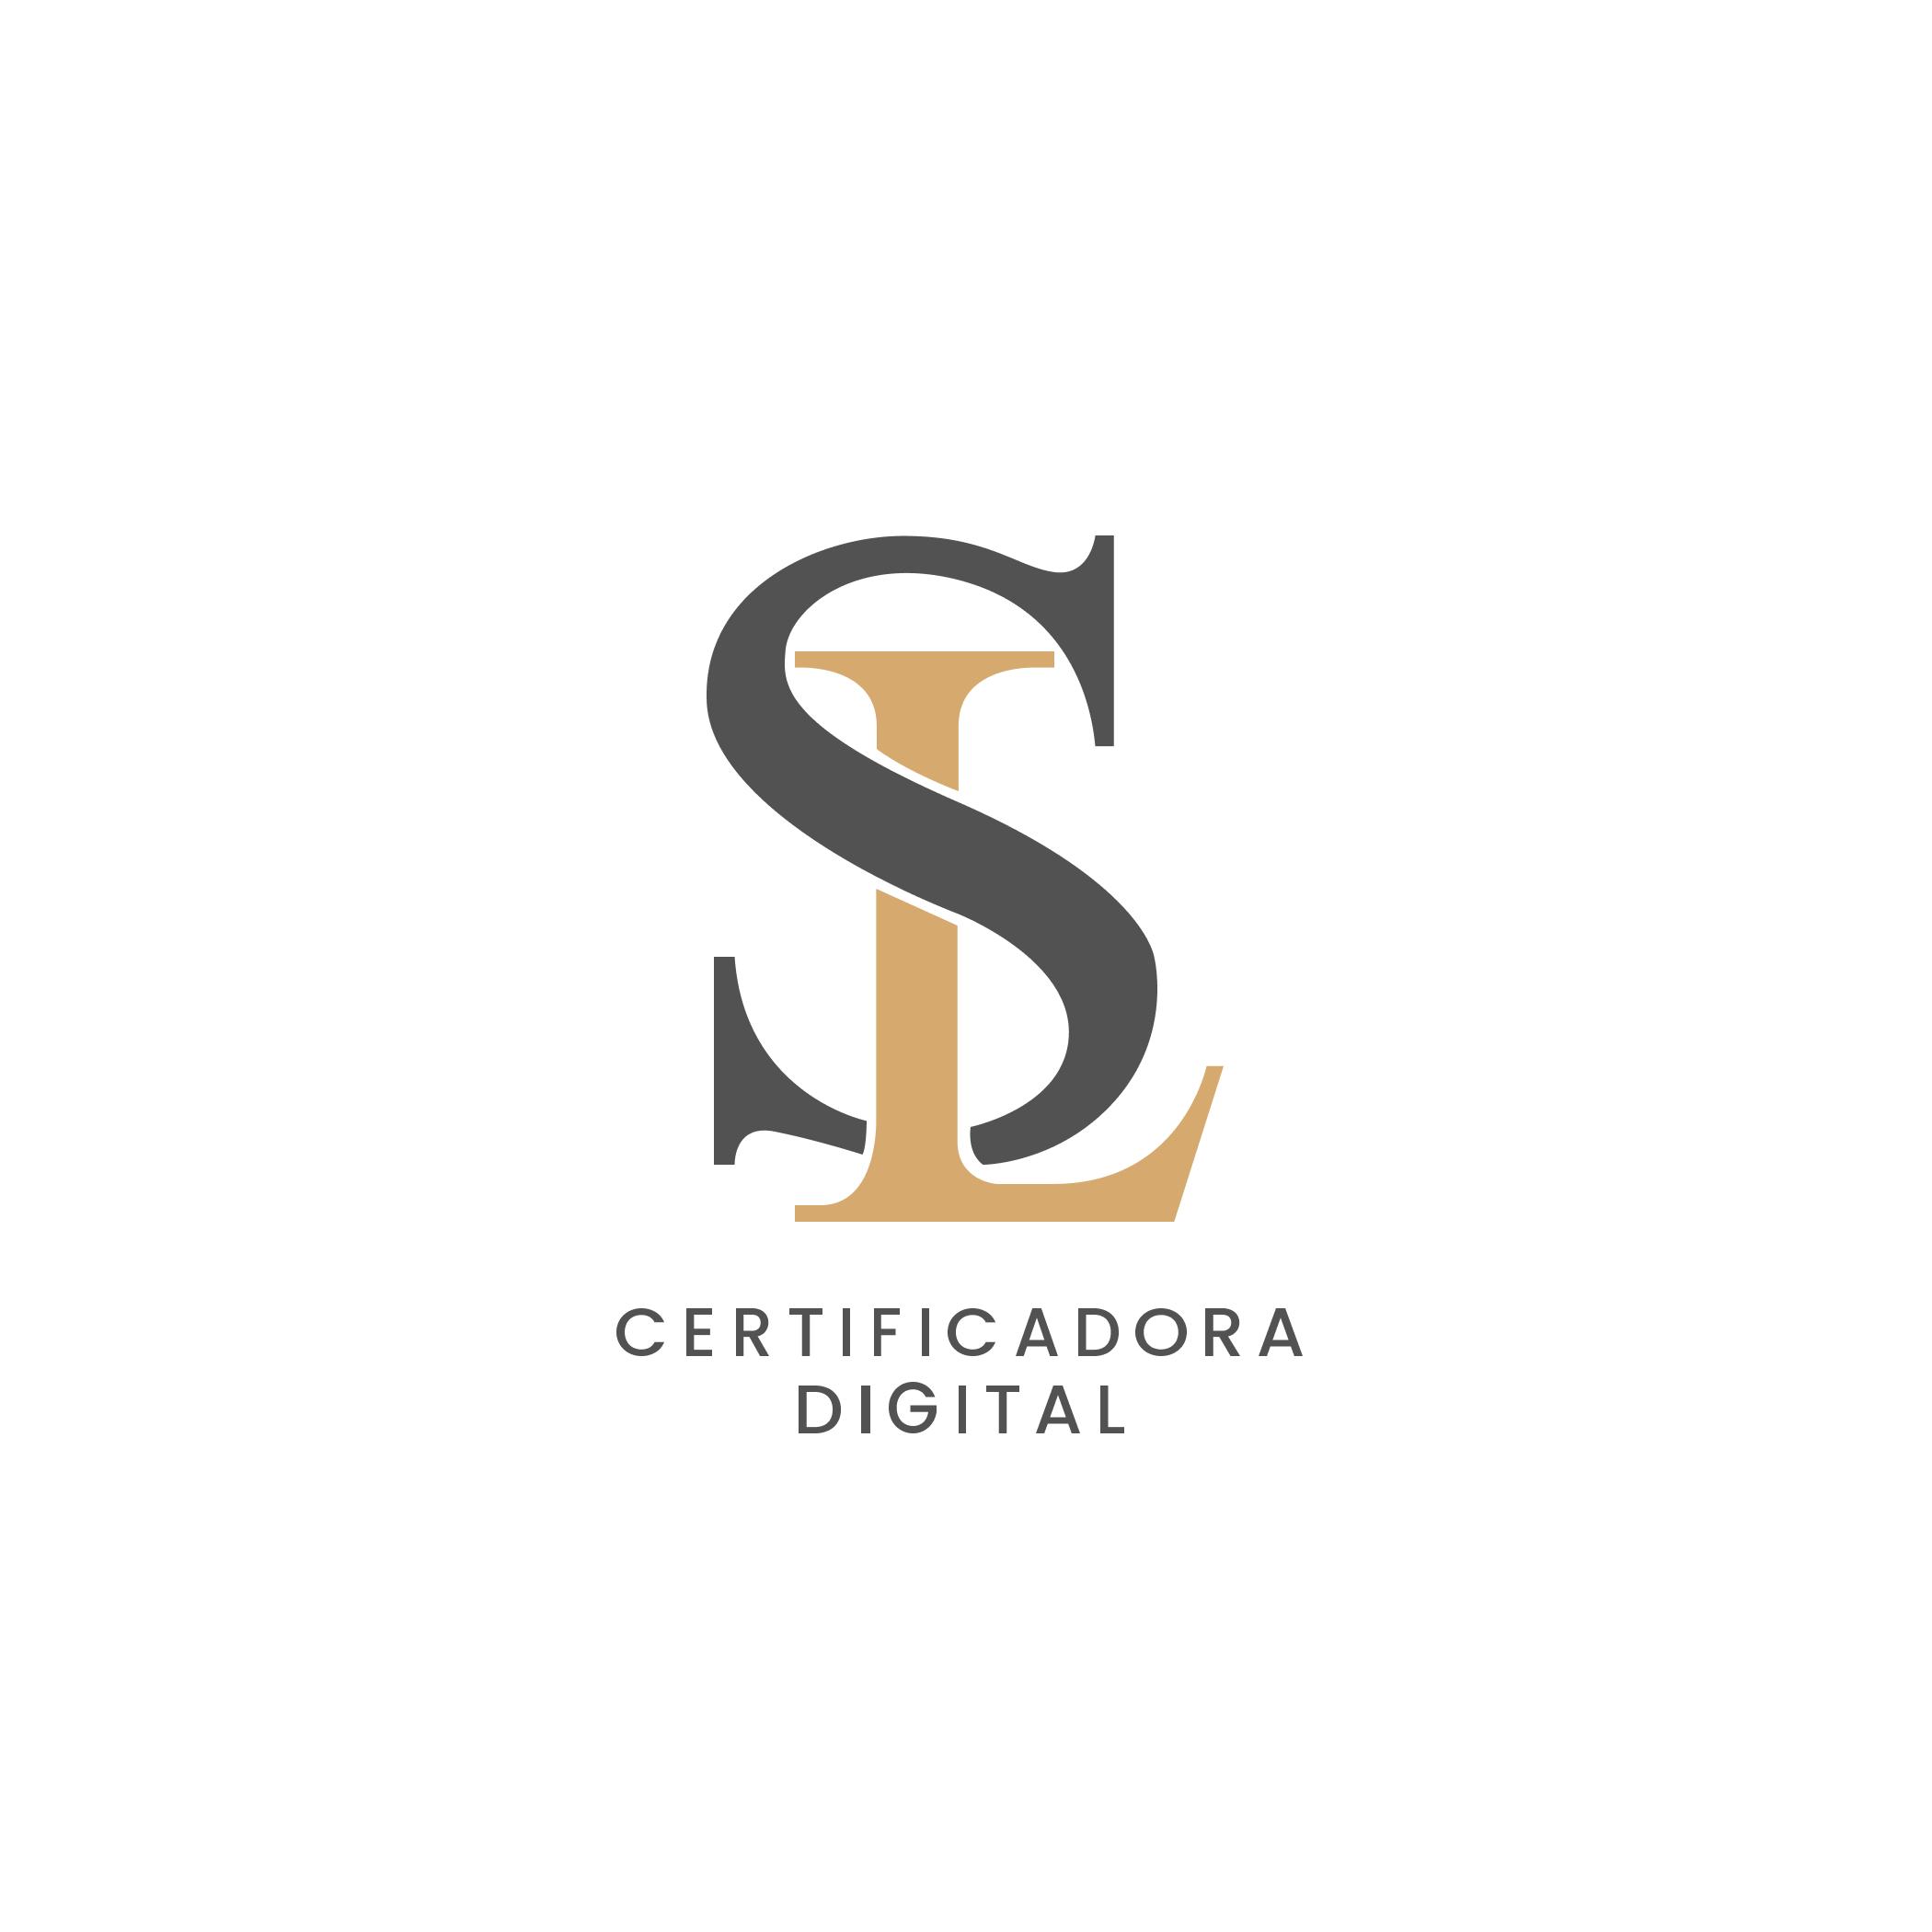 SL CERTIFICADORA DIGILTAL